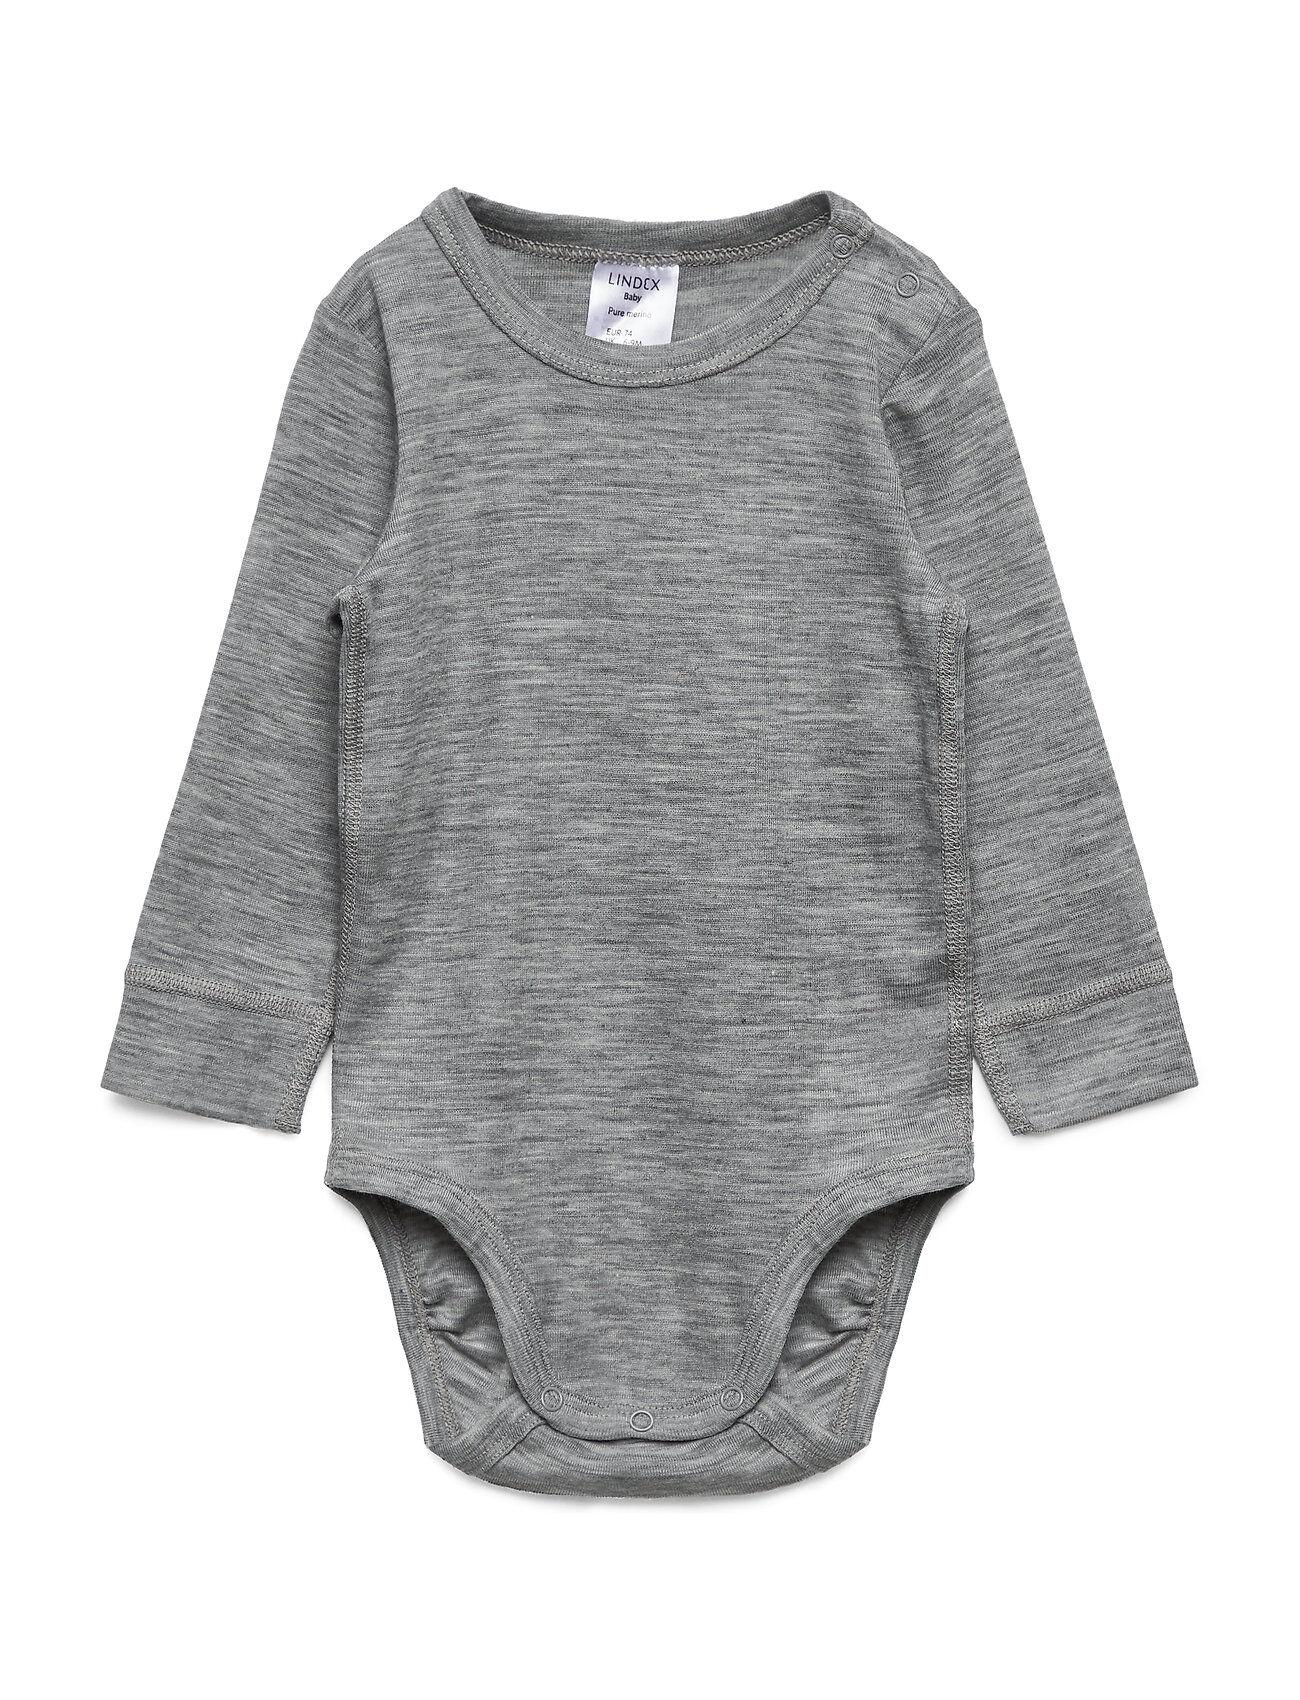 Lindex Body Baby Merino Uni Solid Outerwear Base Layers Harmaa Lindex